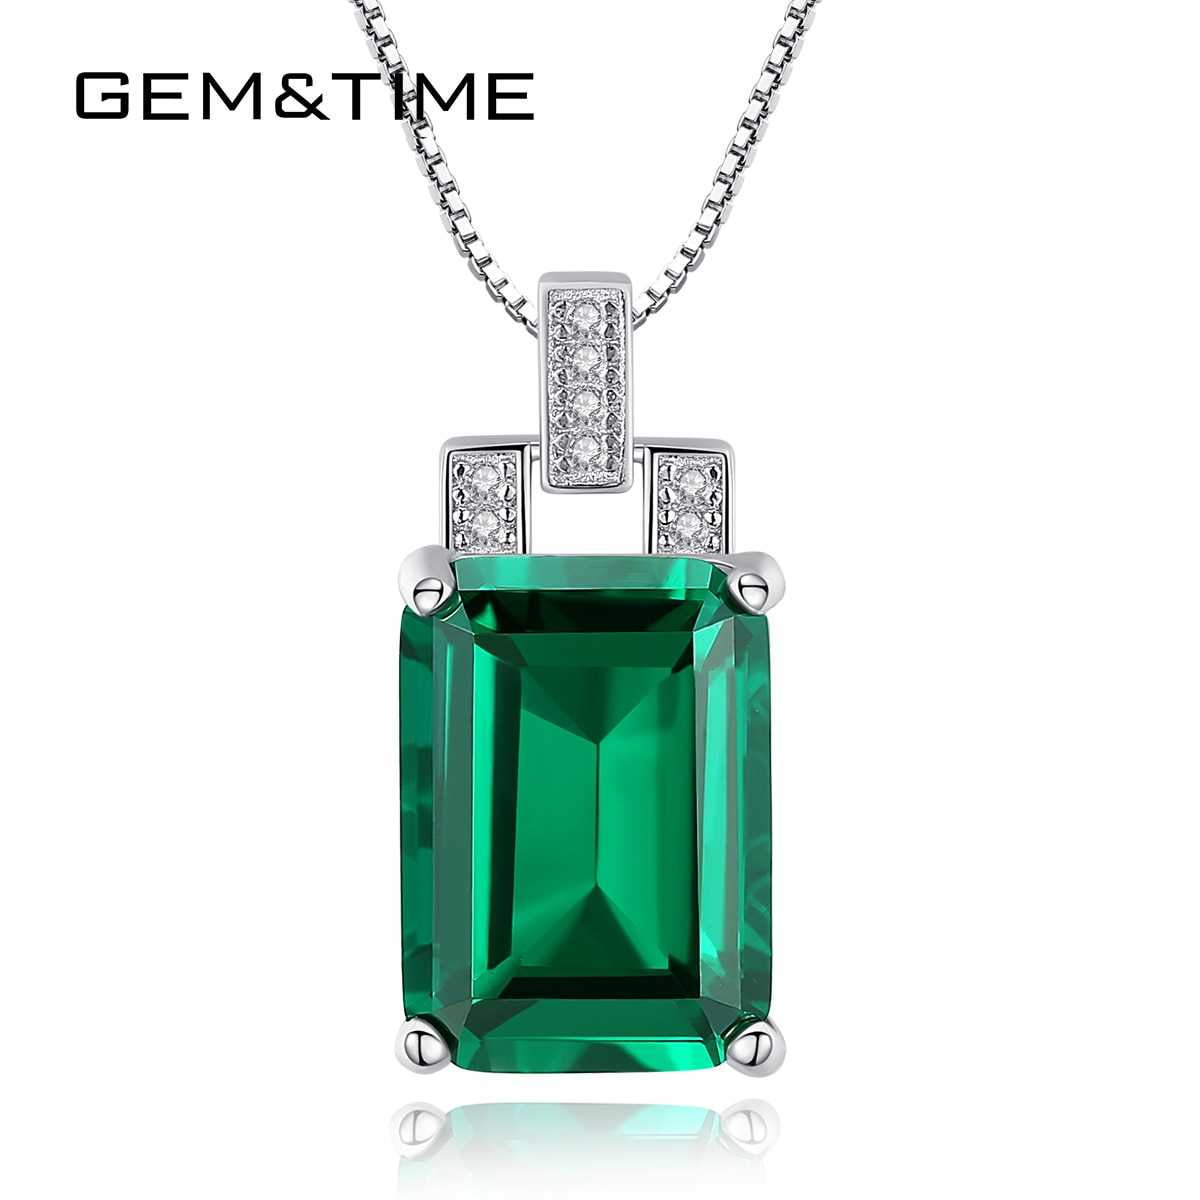 Edelstein & Zeit Erstellt Quadrat Smaragd Saphir Anhänger Neckalce 100% Sterling Silber 925 Choker Halskette Charme Hochzeit Schmuck SN0107